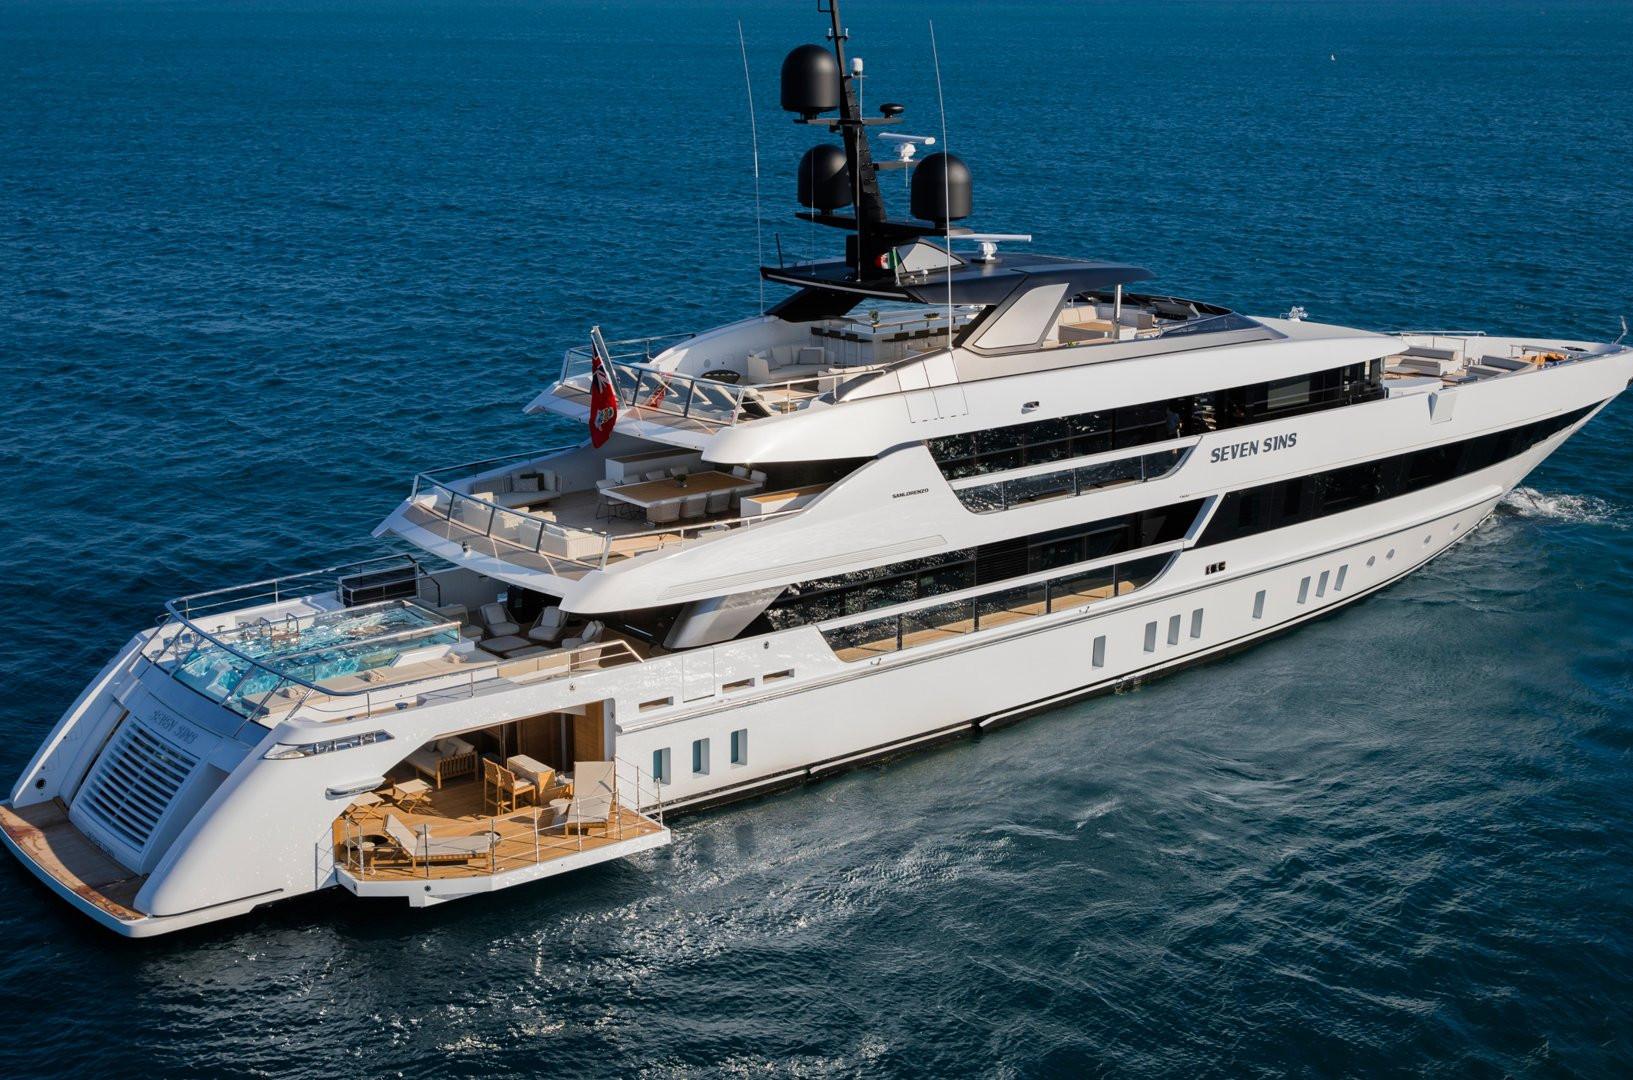 Yacht SEVEN SINS - at anchor